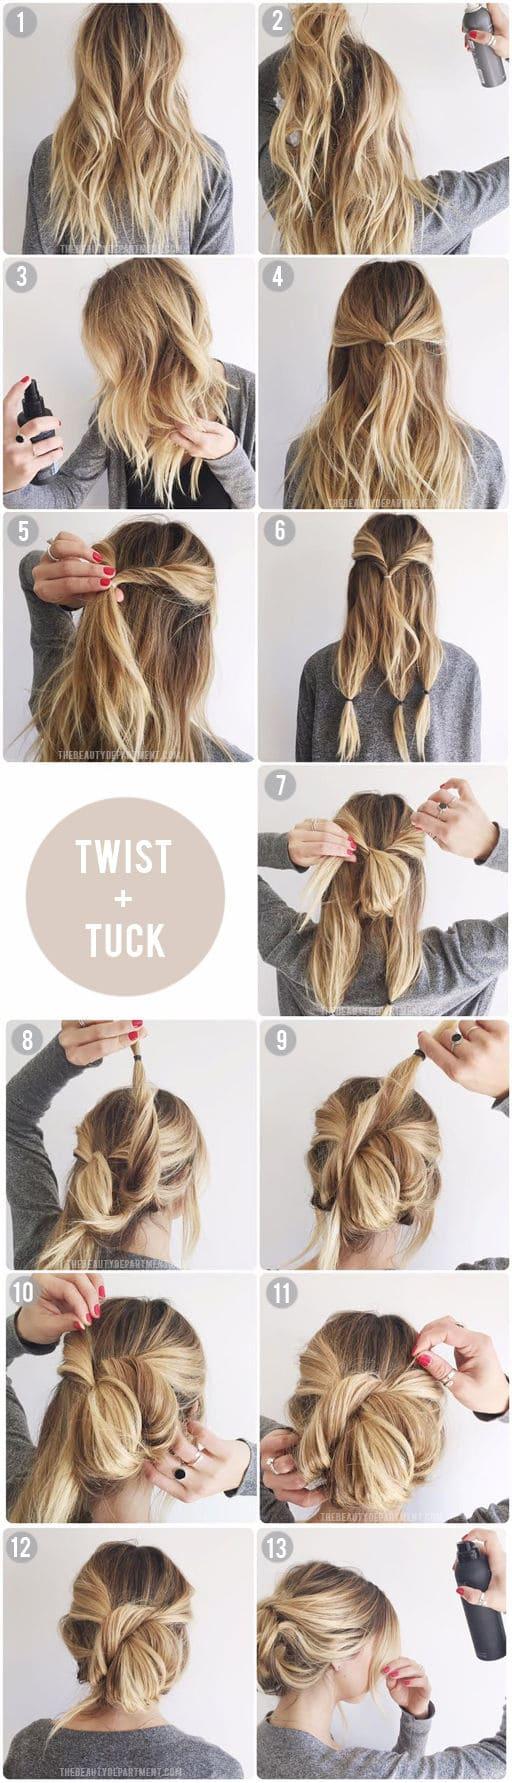 10 Best Hair Tutorials Girls Should Try This Summer 2017